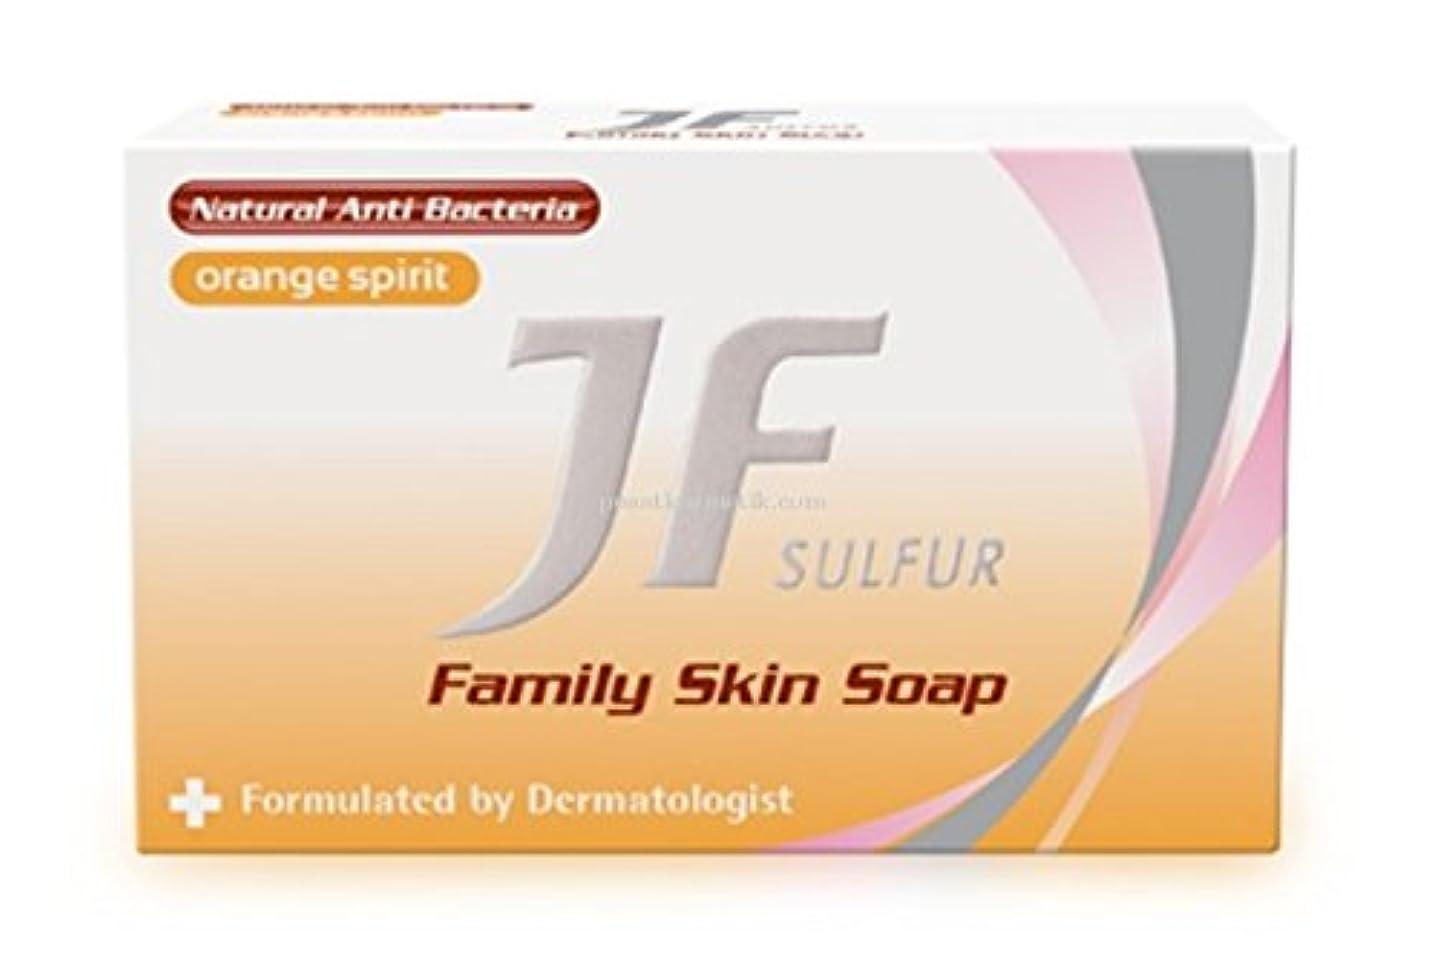 JF Sulfur ファミリー消毒石鹸オレンジスピリット、90グラム